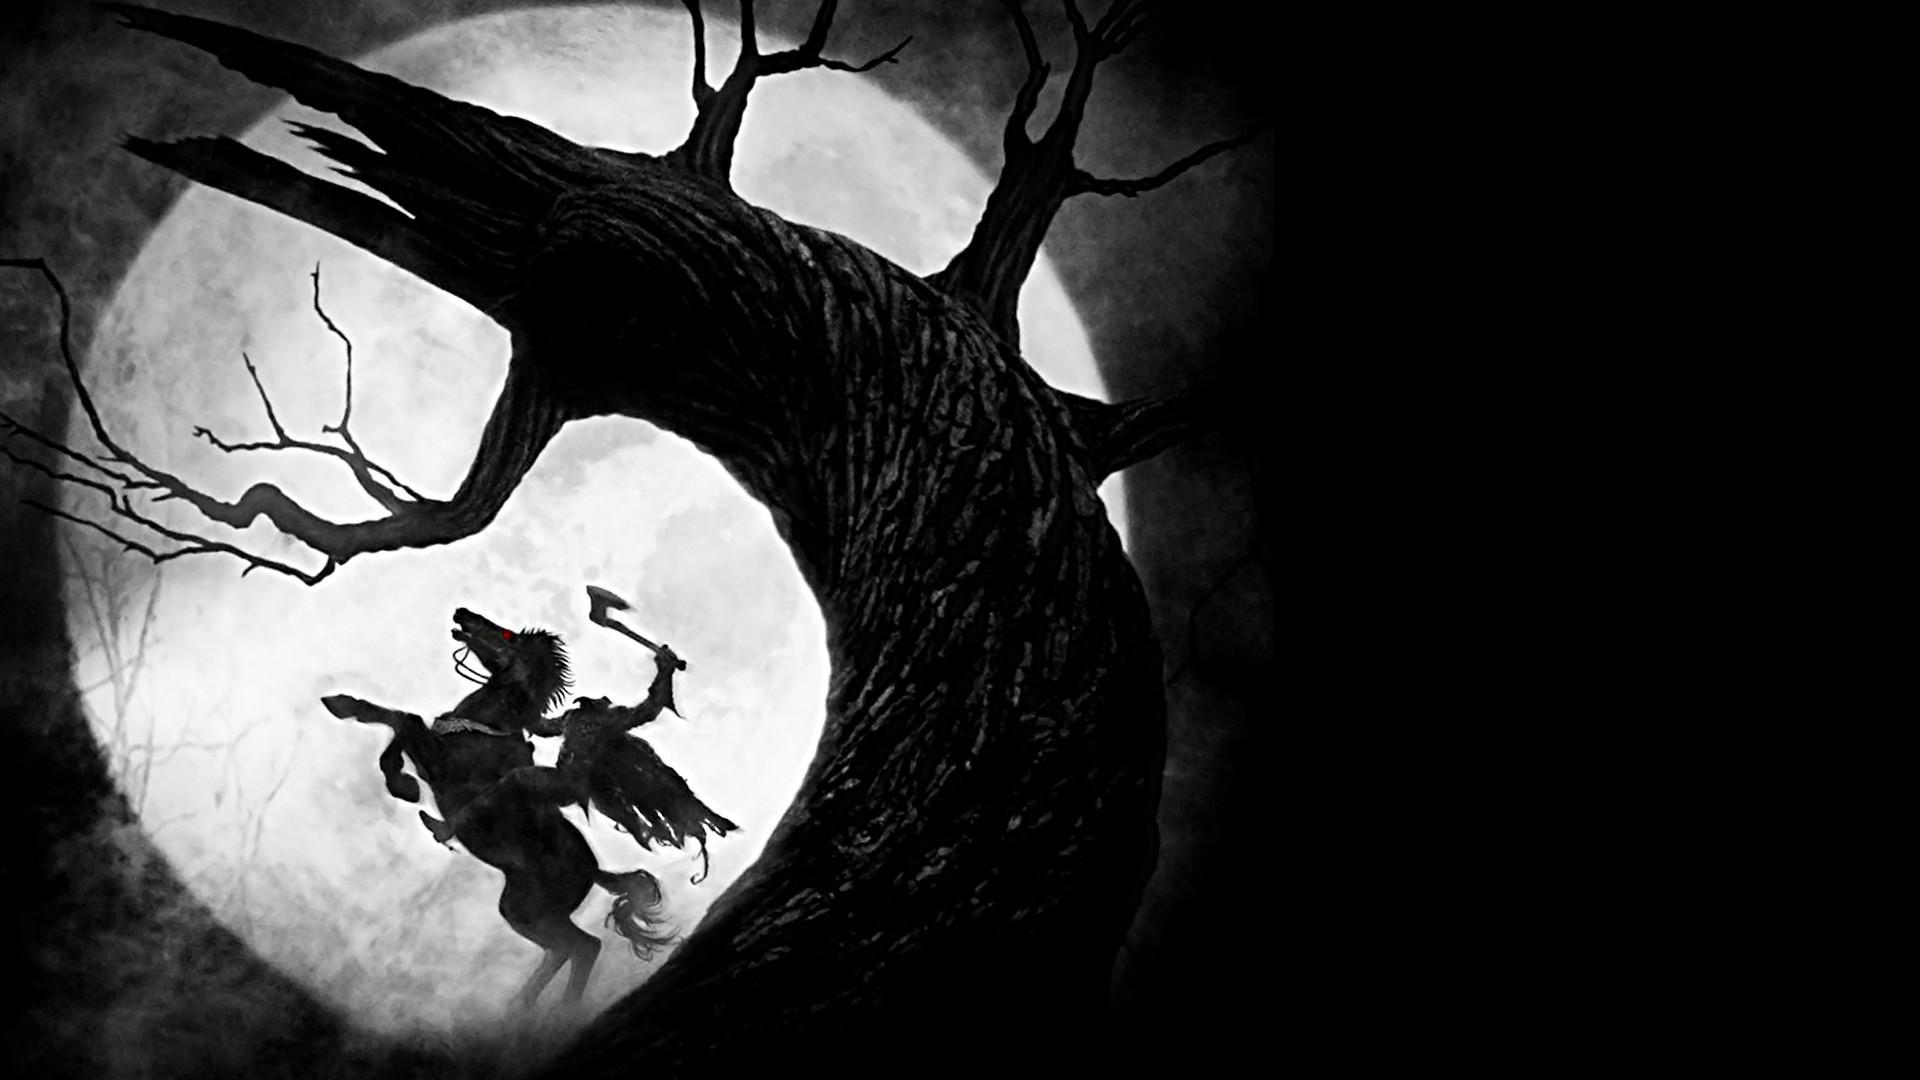 Good Wallpaper Halloween Horse - sleepy_hollow_headless_horseman_moon_tree_3542_1920x1080  Photograph_246371.jpg